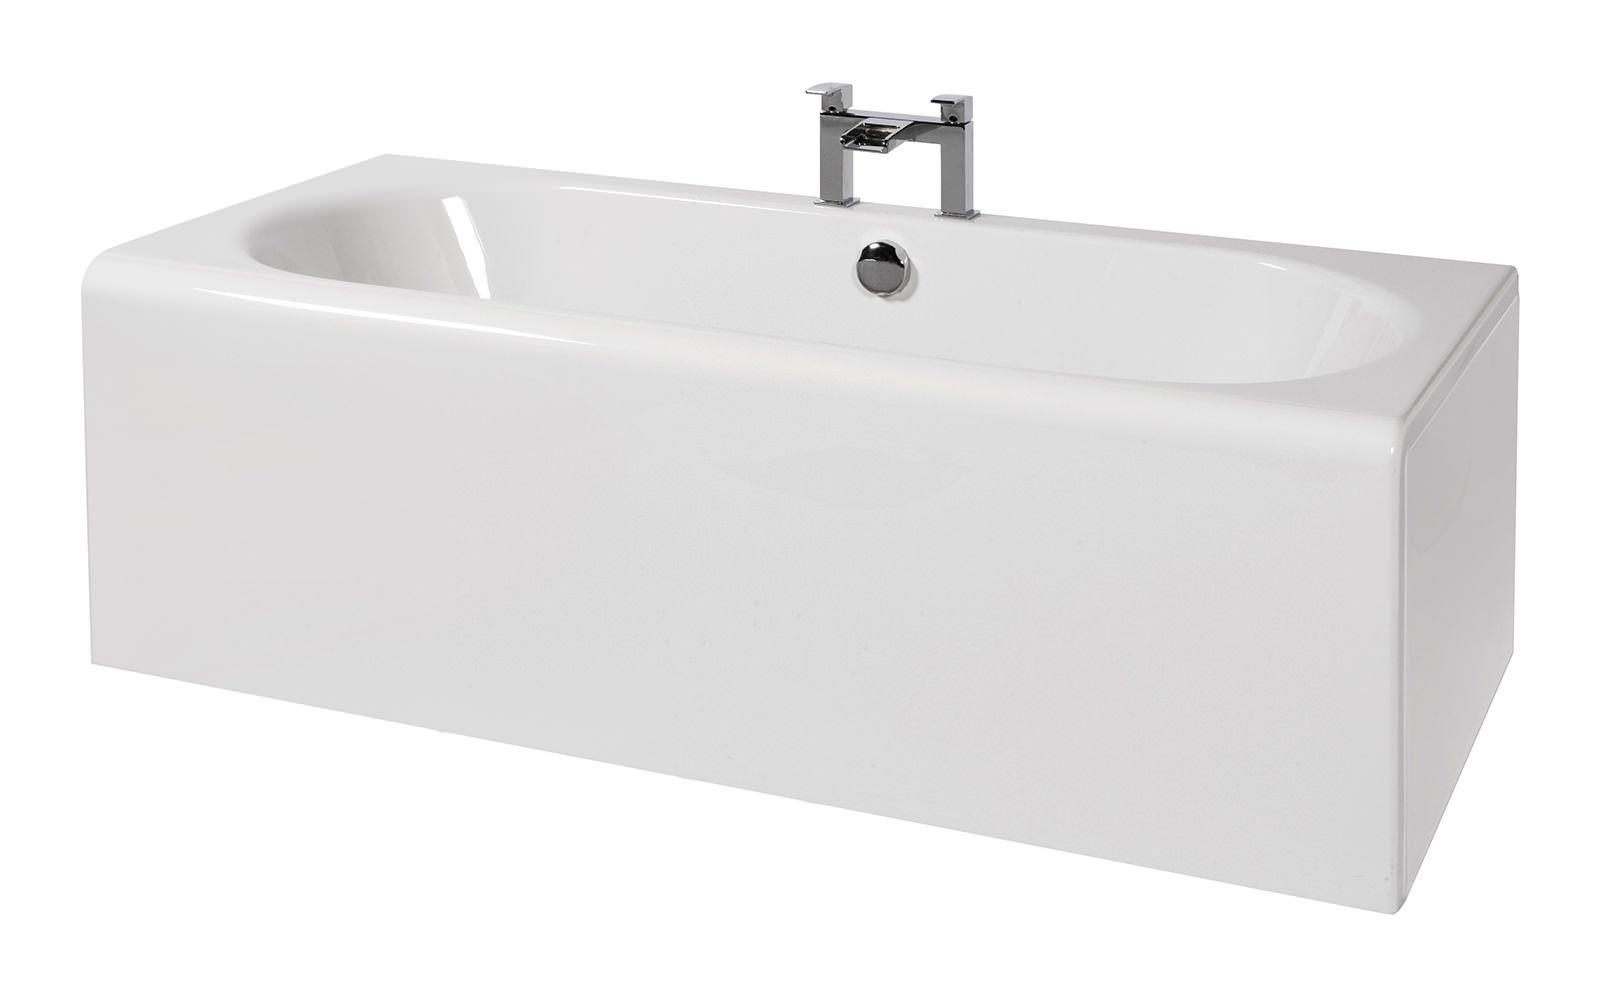 Balterley bathroom furniture - Explore Bathroom Furniture Beautiful Bathrooms And More